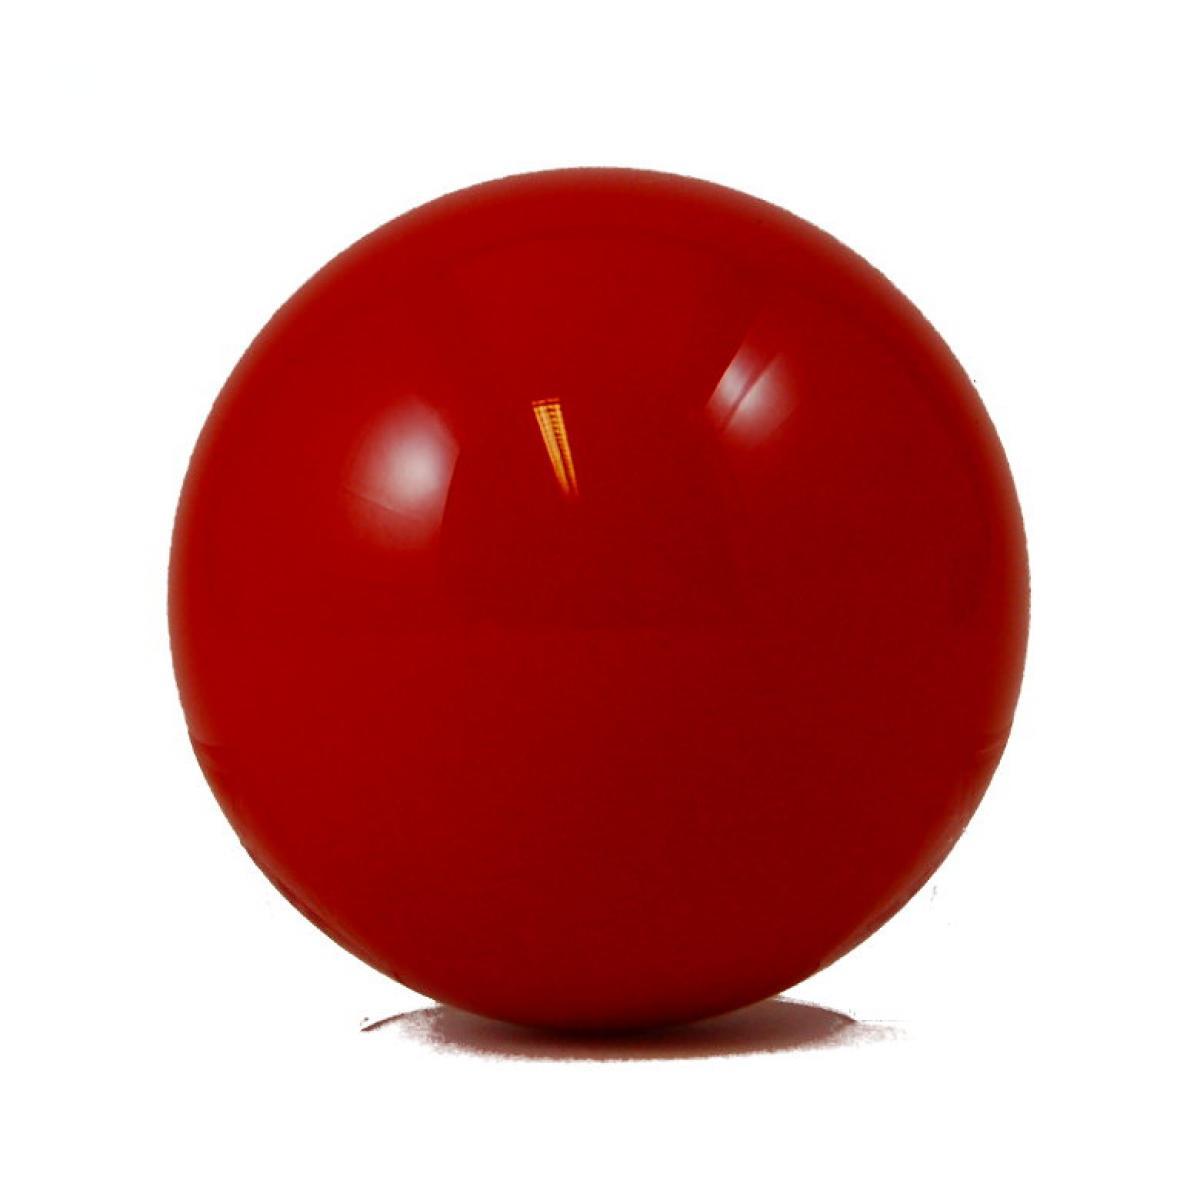 Ярко красный шар картинка